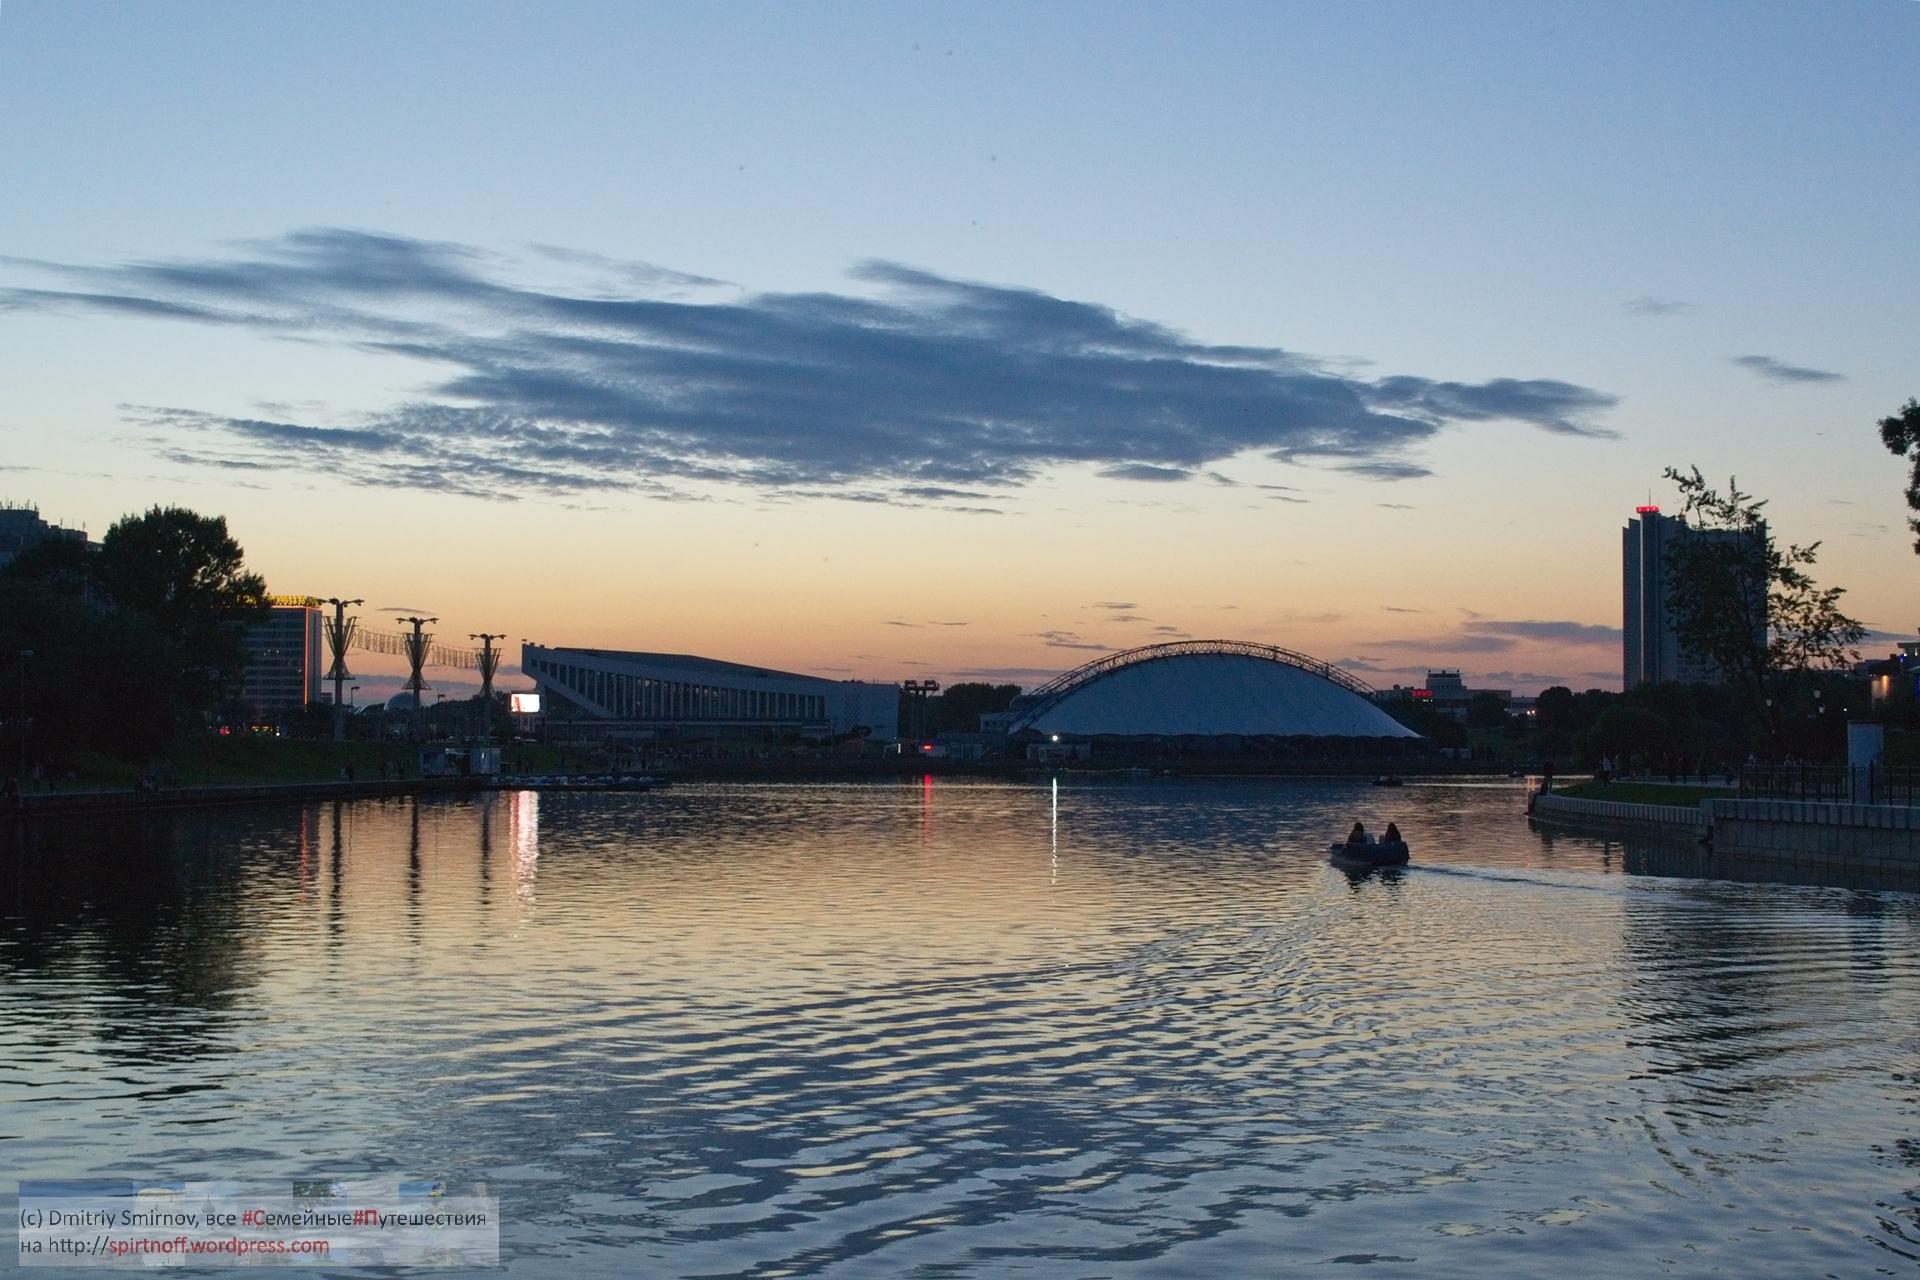 DSC_7272-63-Blog-59 Путешествия  Минск. Закат и город